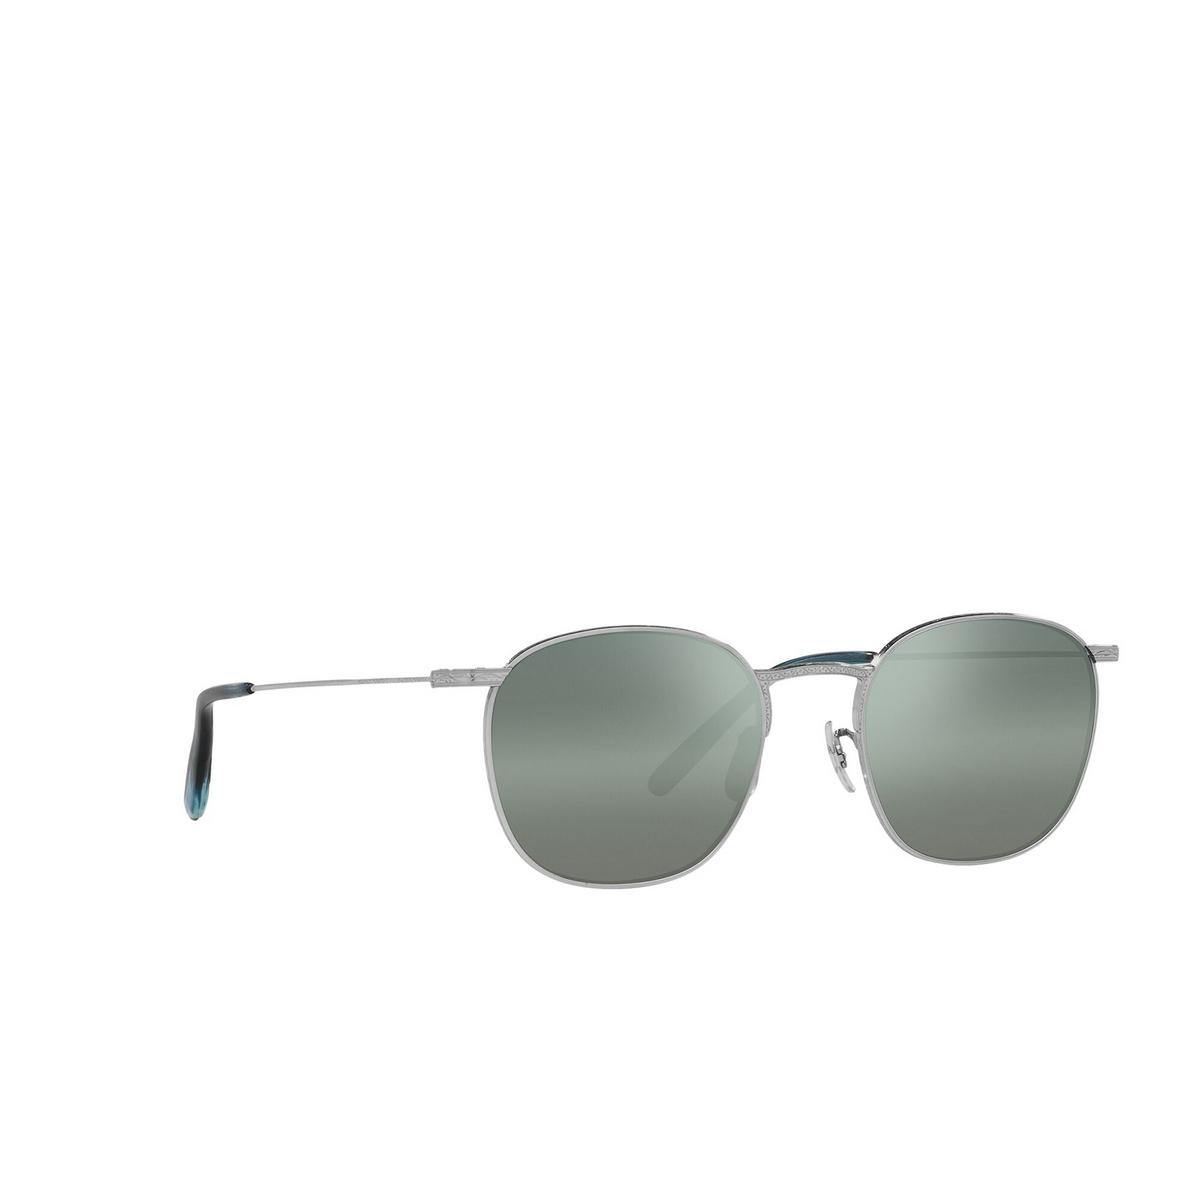 Oliver Peoples® Square Sunglasses: Goldsen Sun OV1285ST color Silver 503641 - three-quarters view.